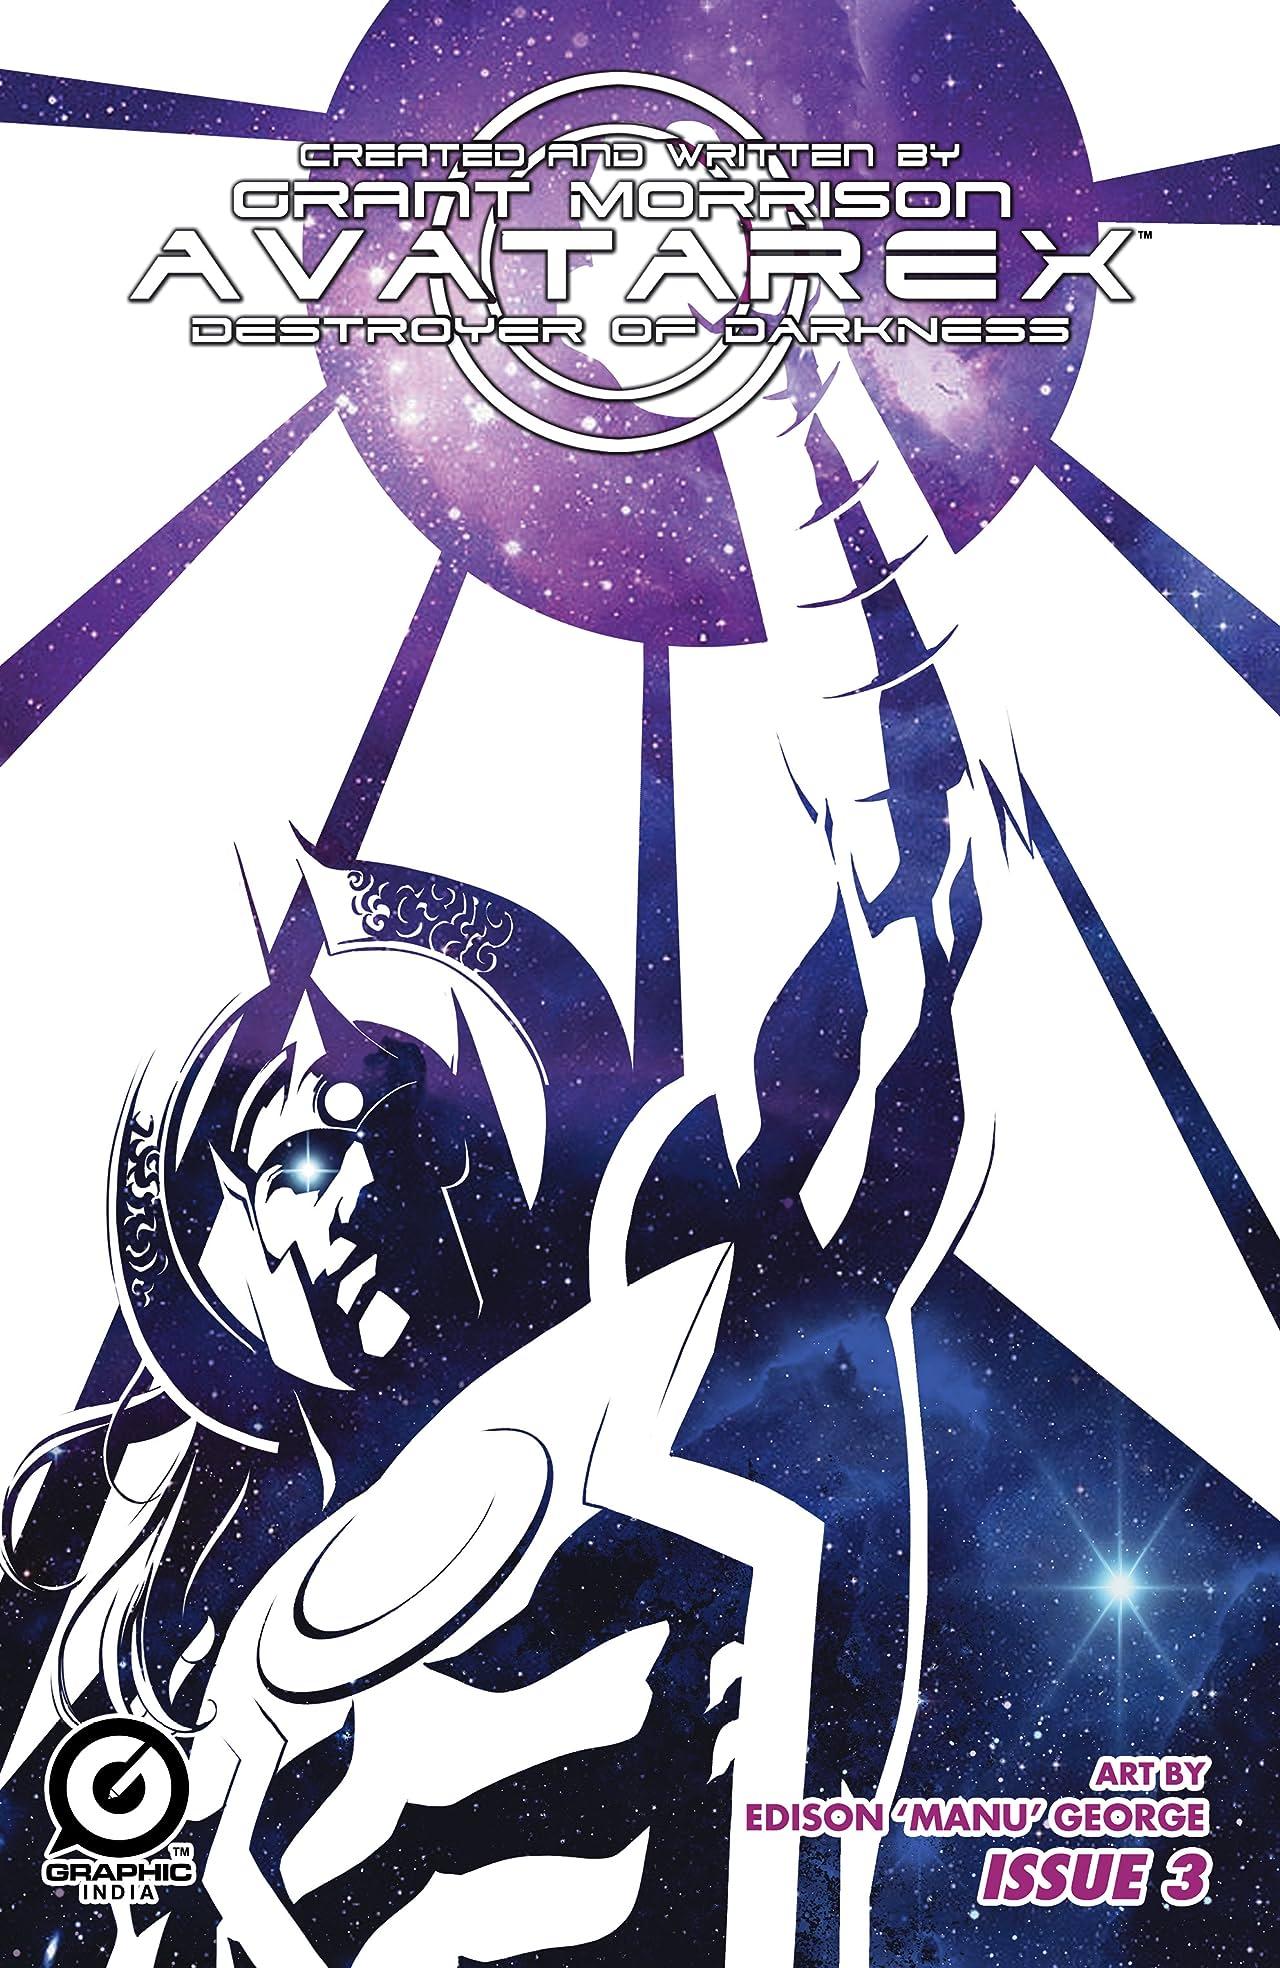 Grant Morrison's Avatarex: Destroyer of Darkness #3